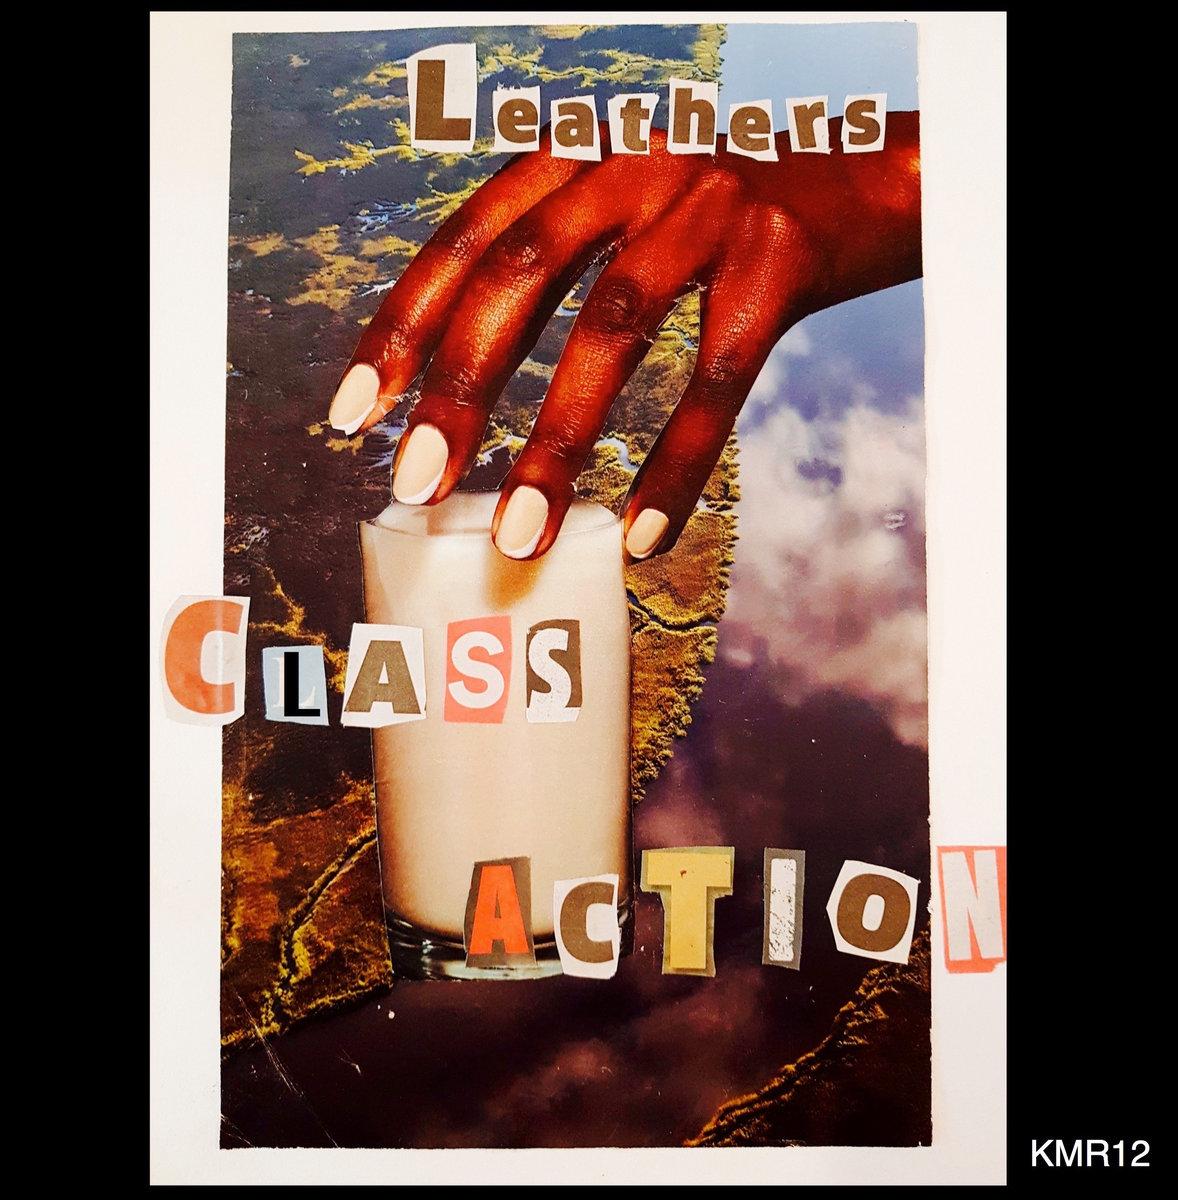 Leathersclassaction